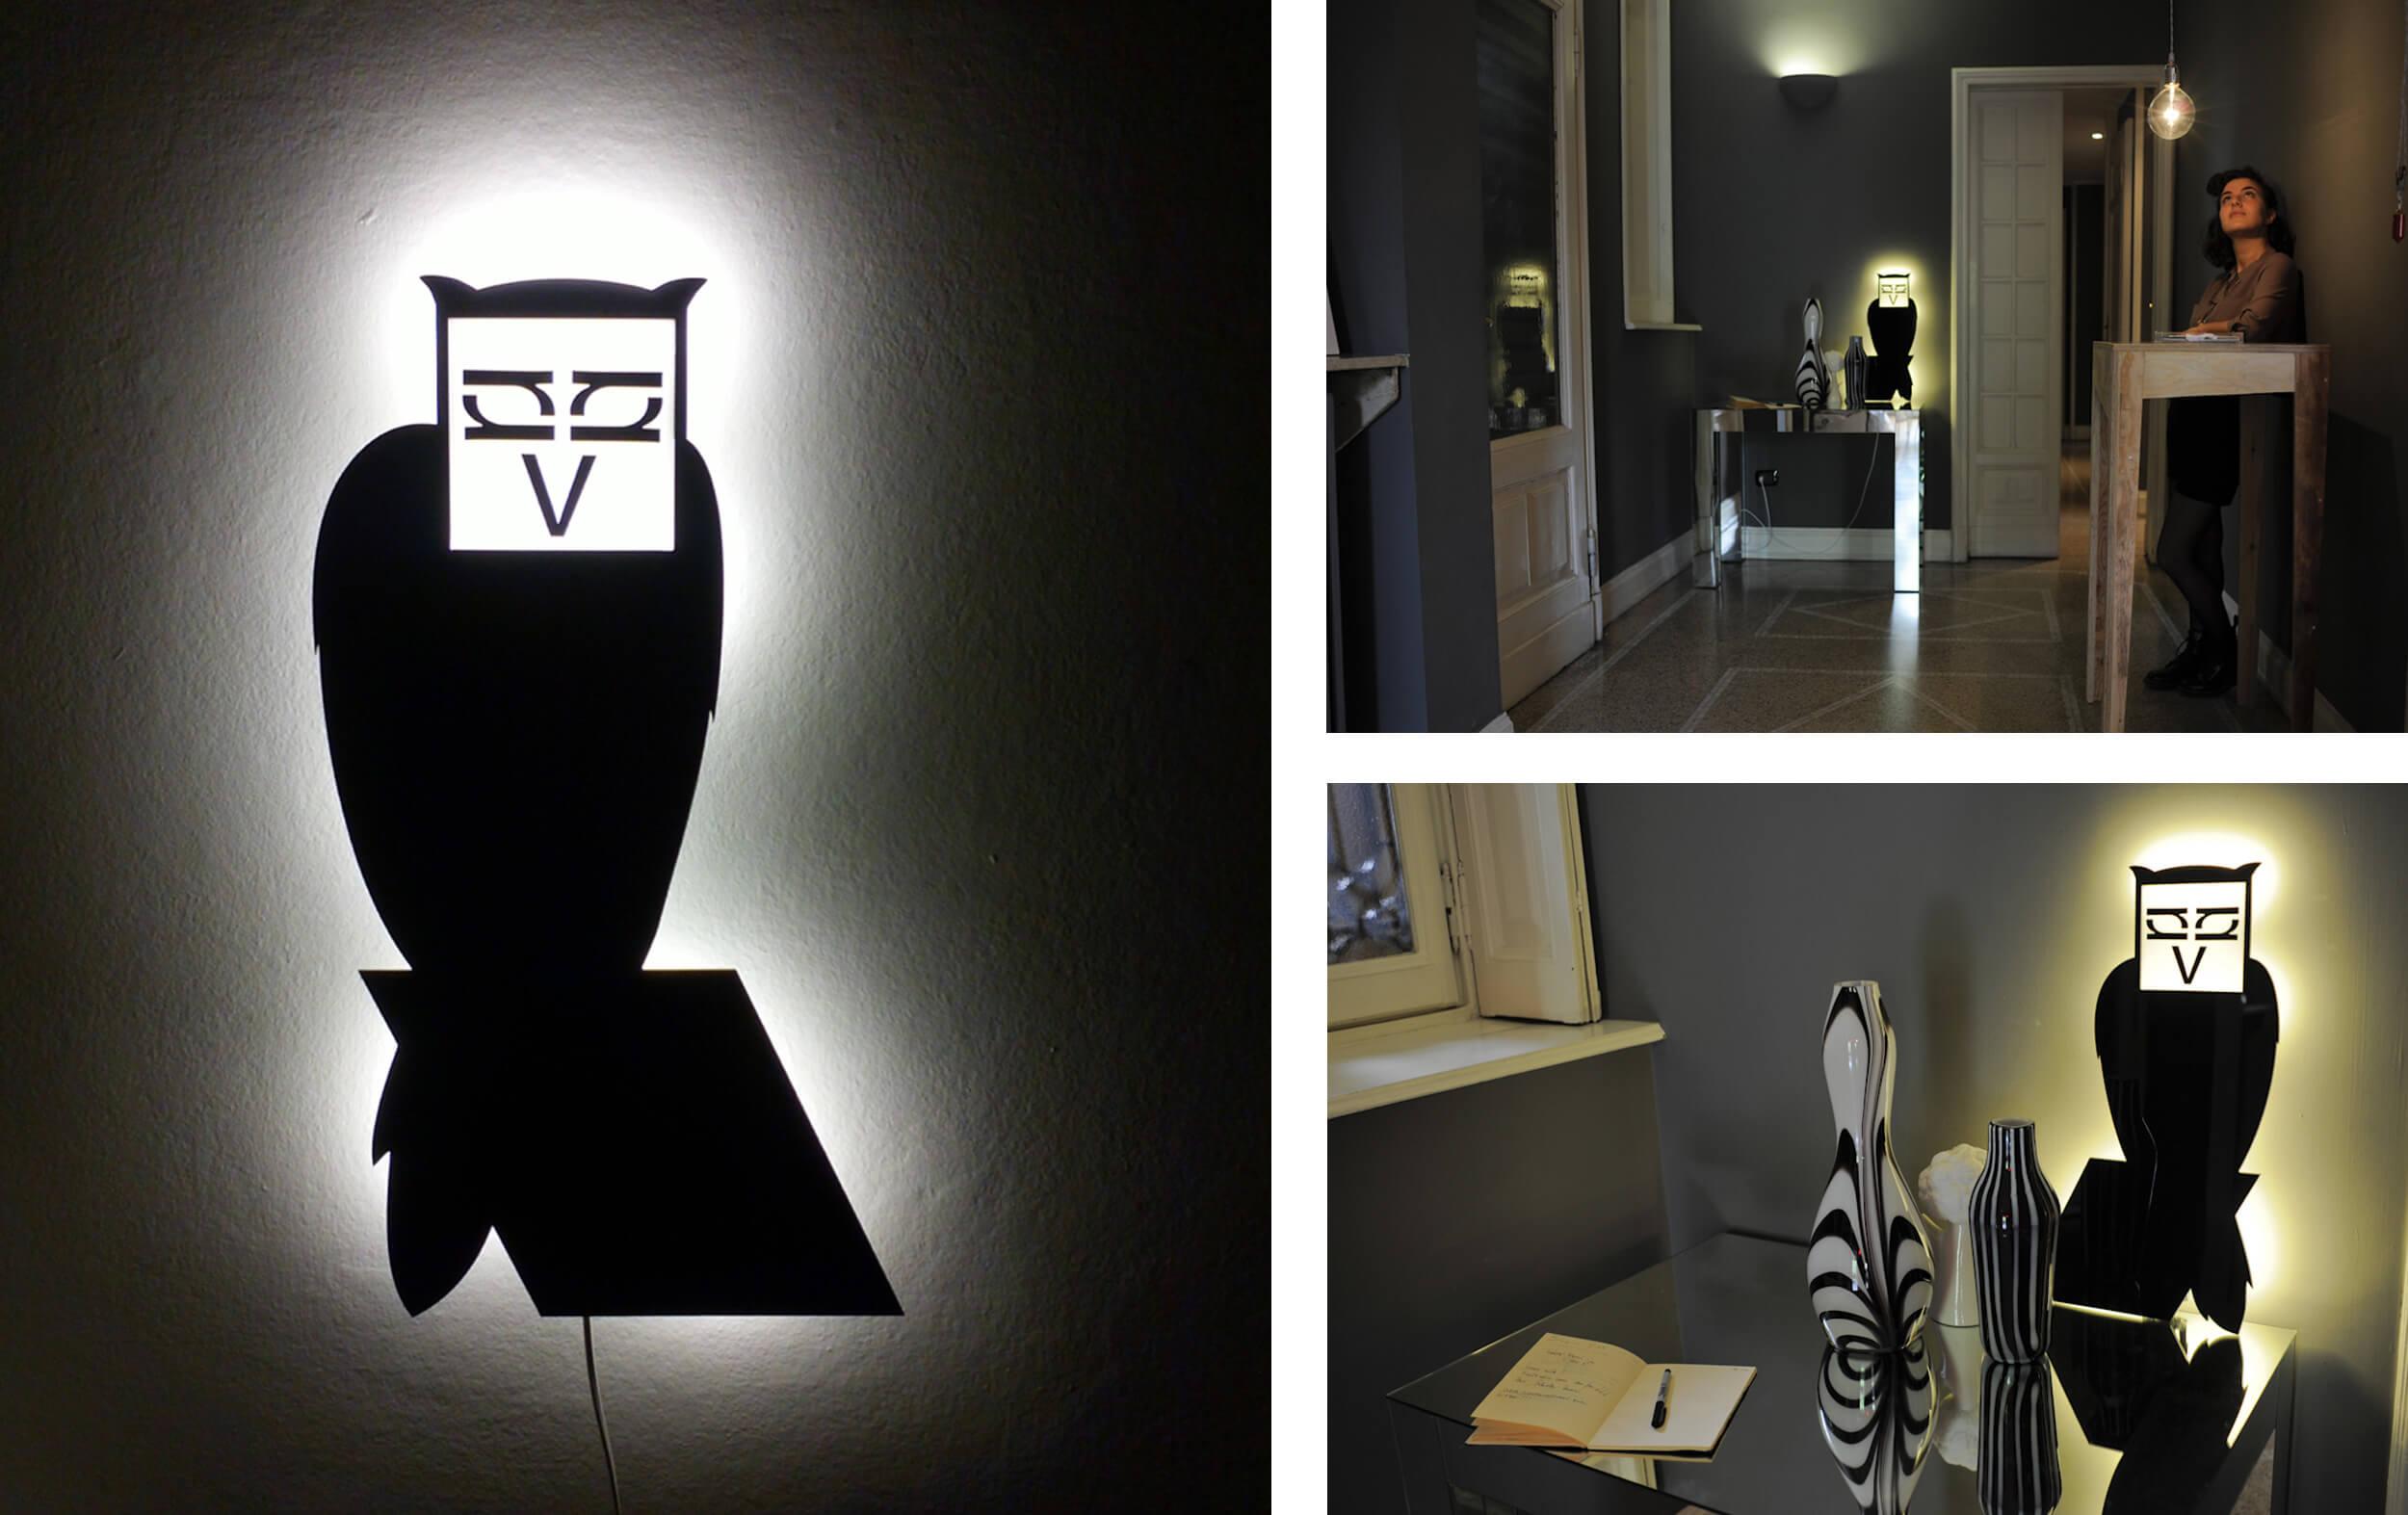 Owl_lamp_Fontface_Gabriele_Demarin